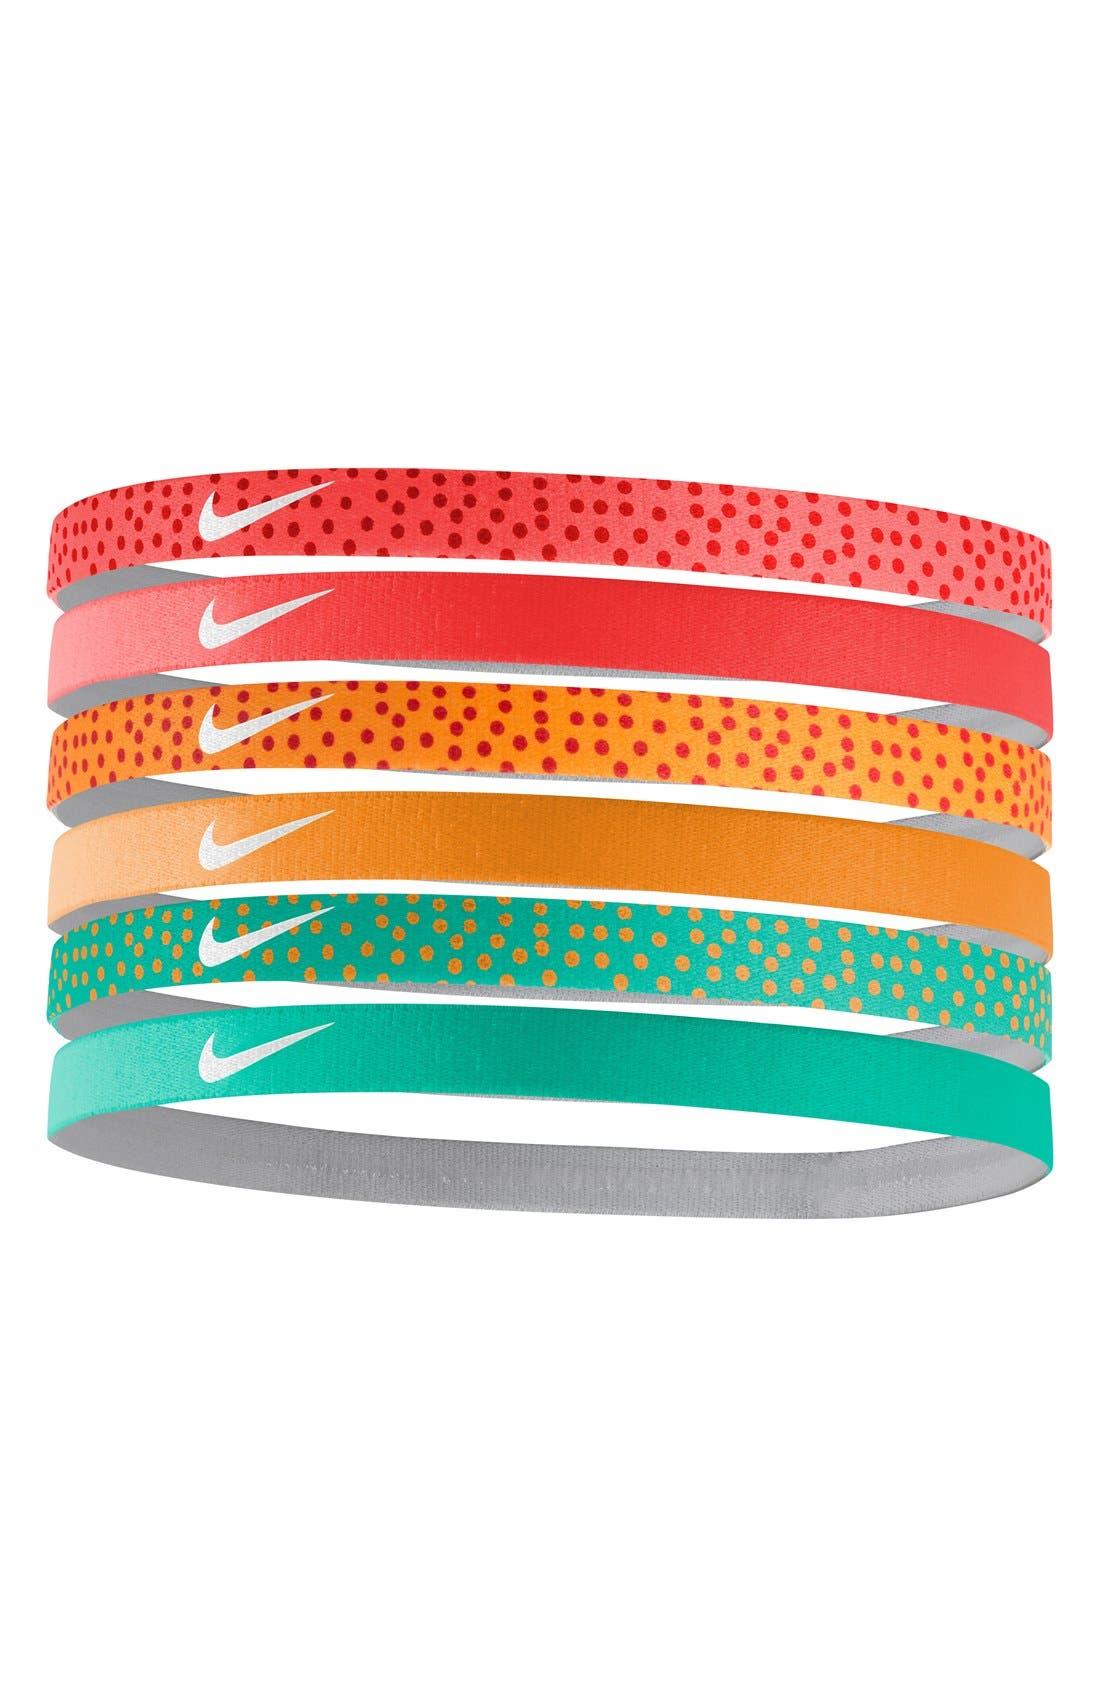 Alternate Image 1 Selected - Nike Sport Headbands (6-Pack)